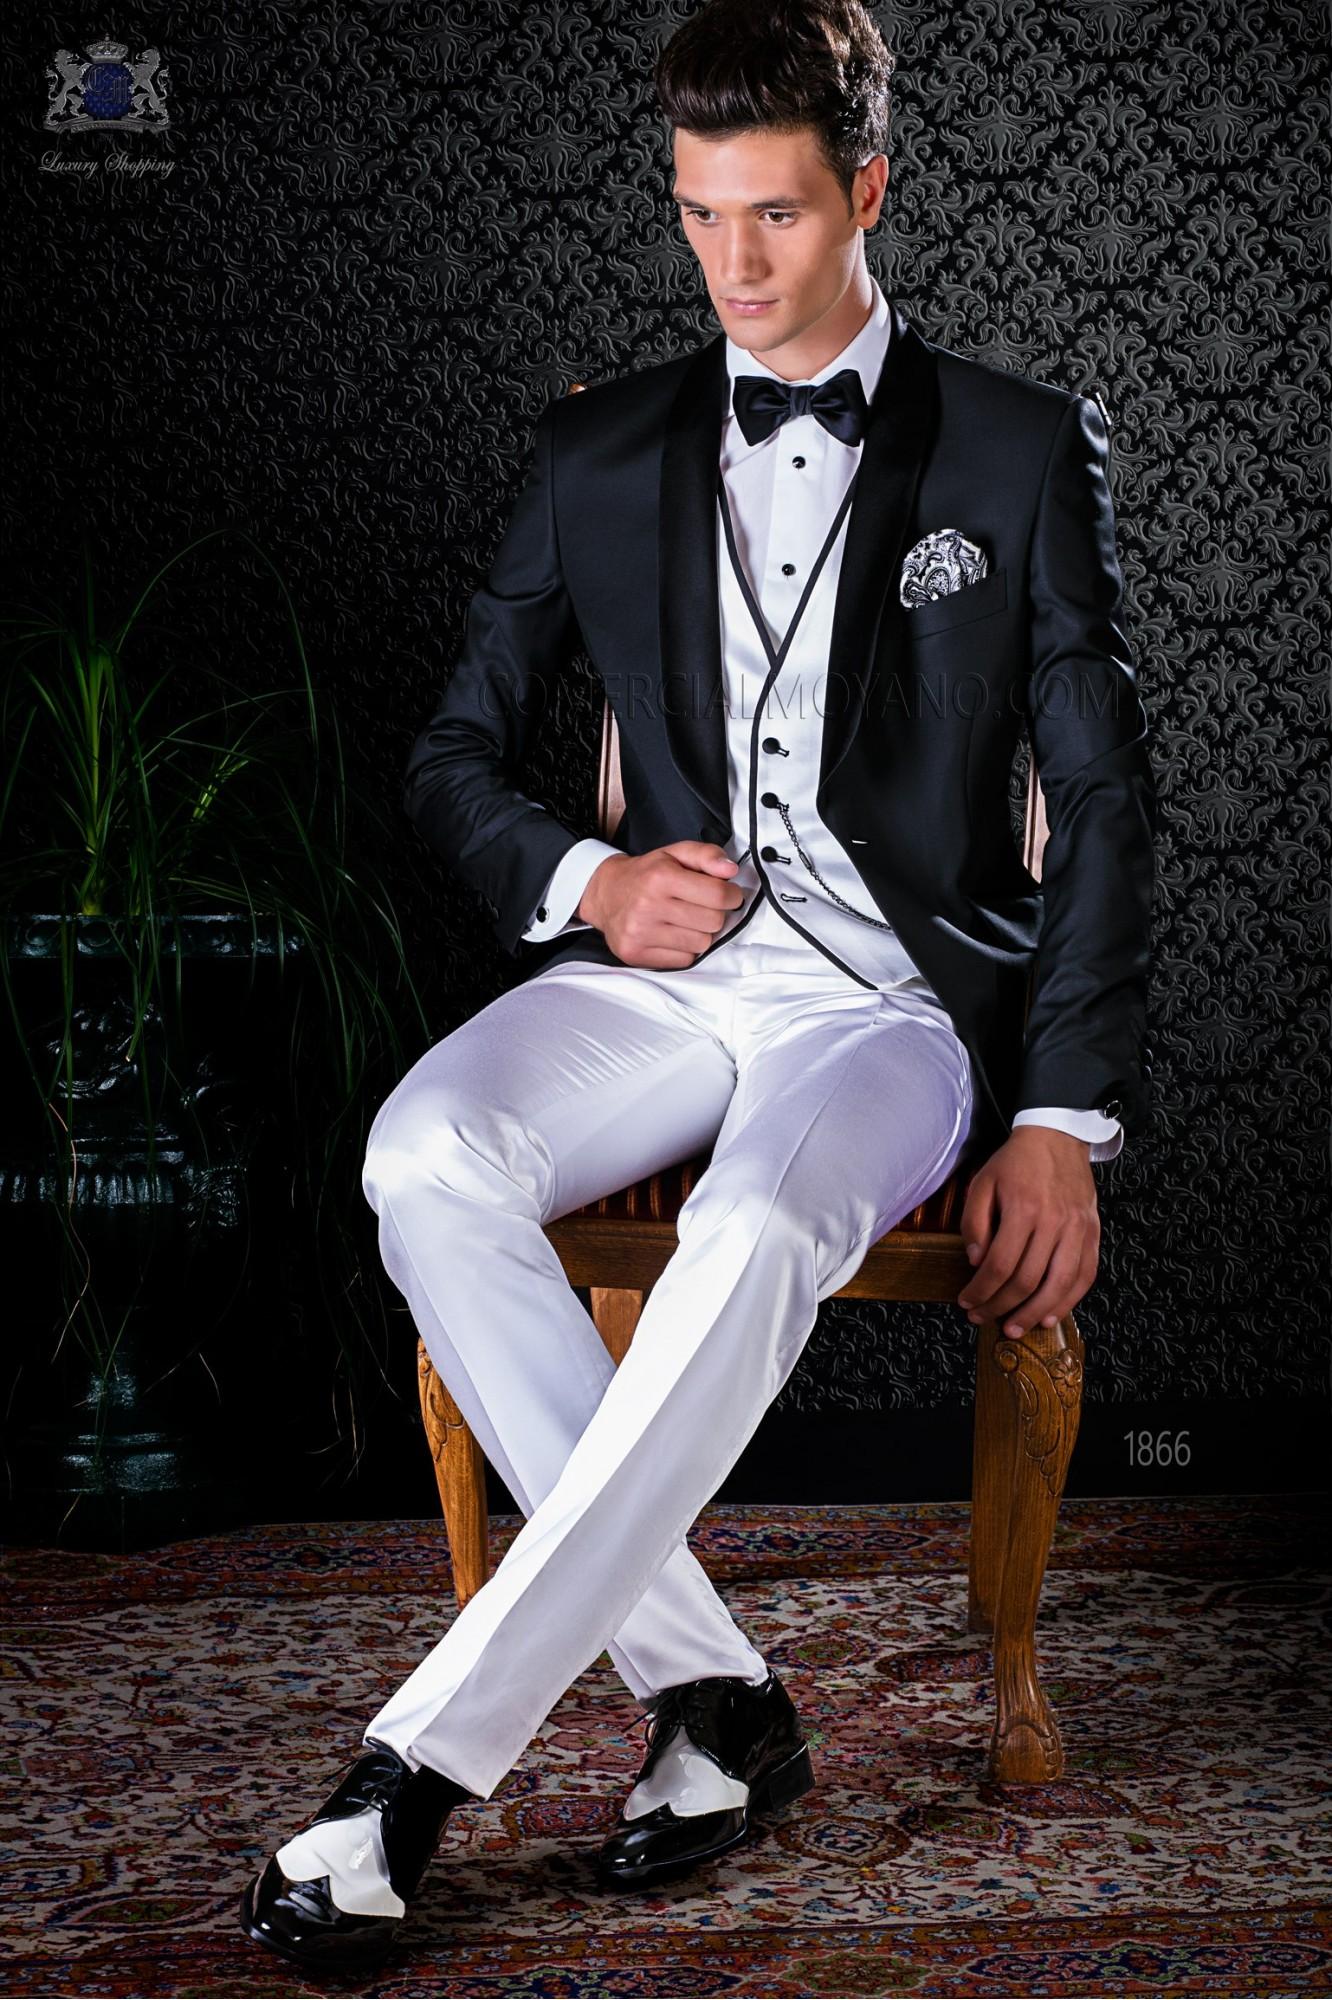 Esmoquin negro italiano con solapa chal combinado con blanco